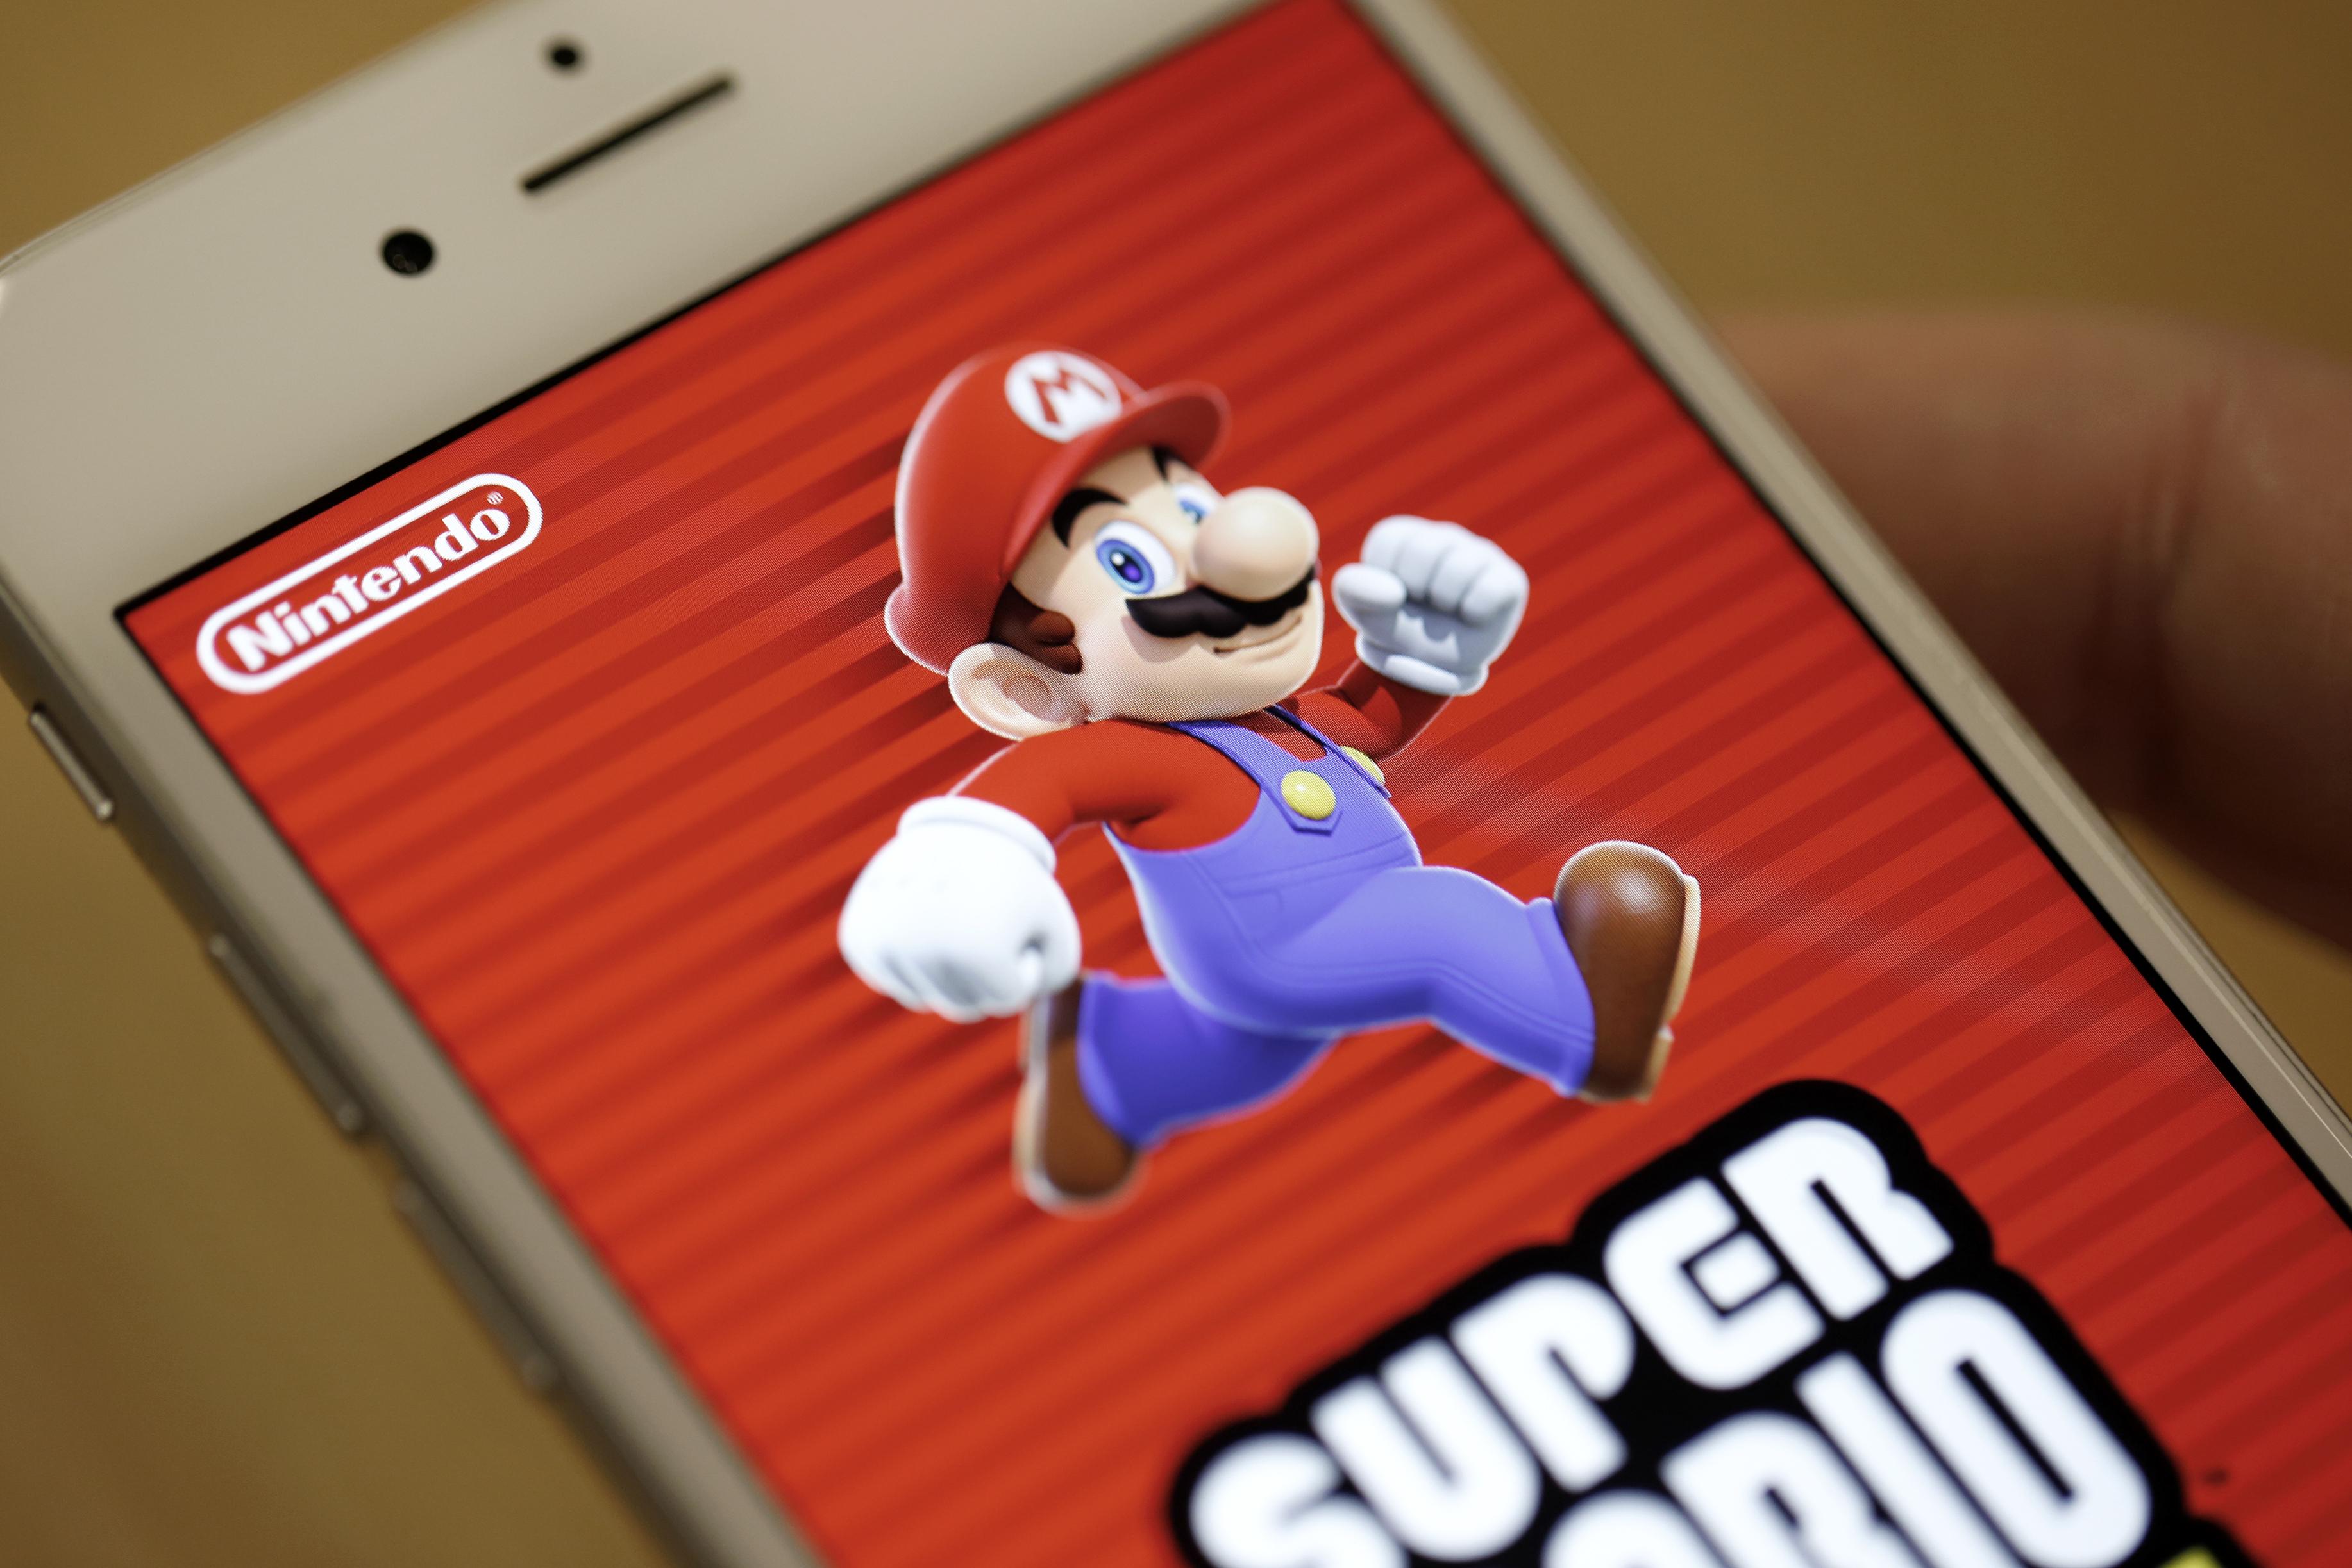 Debut Of Nintendo Co. Super Mario Run In Japan